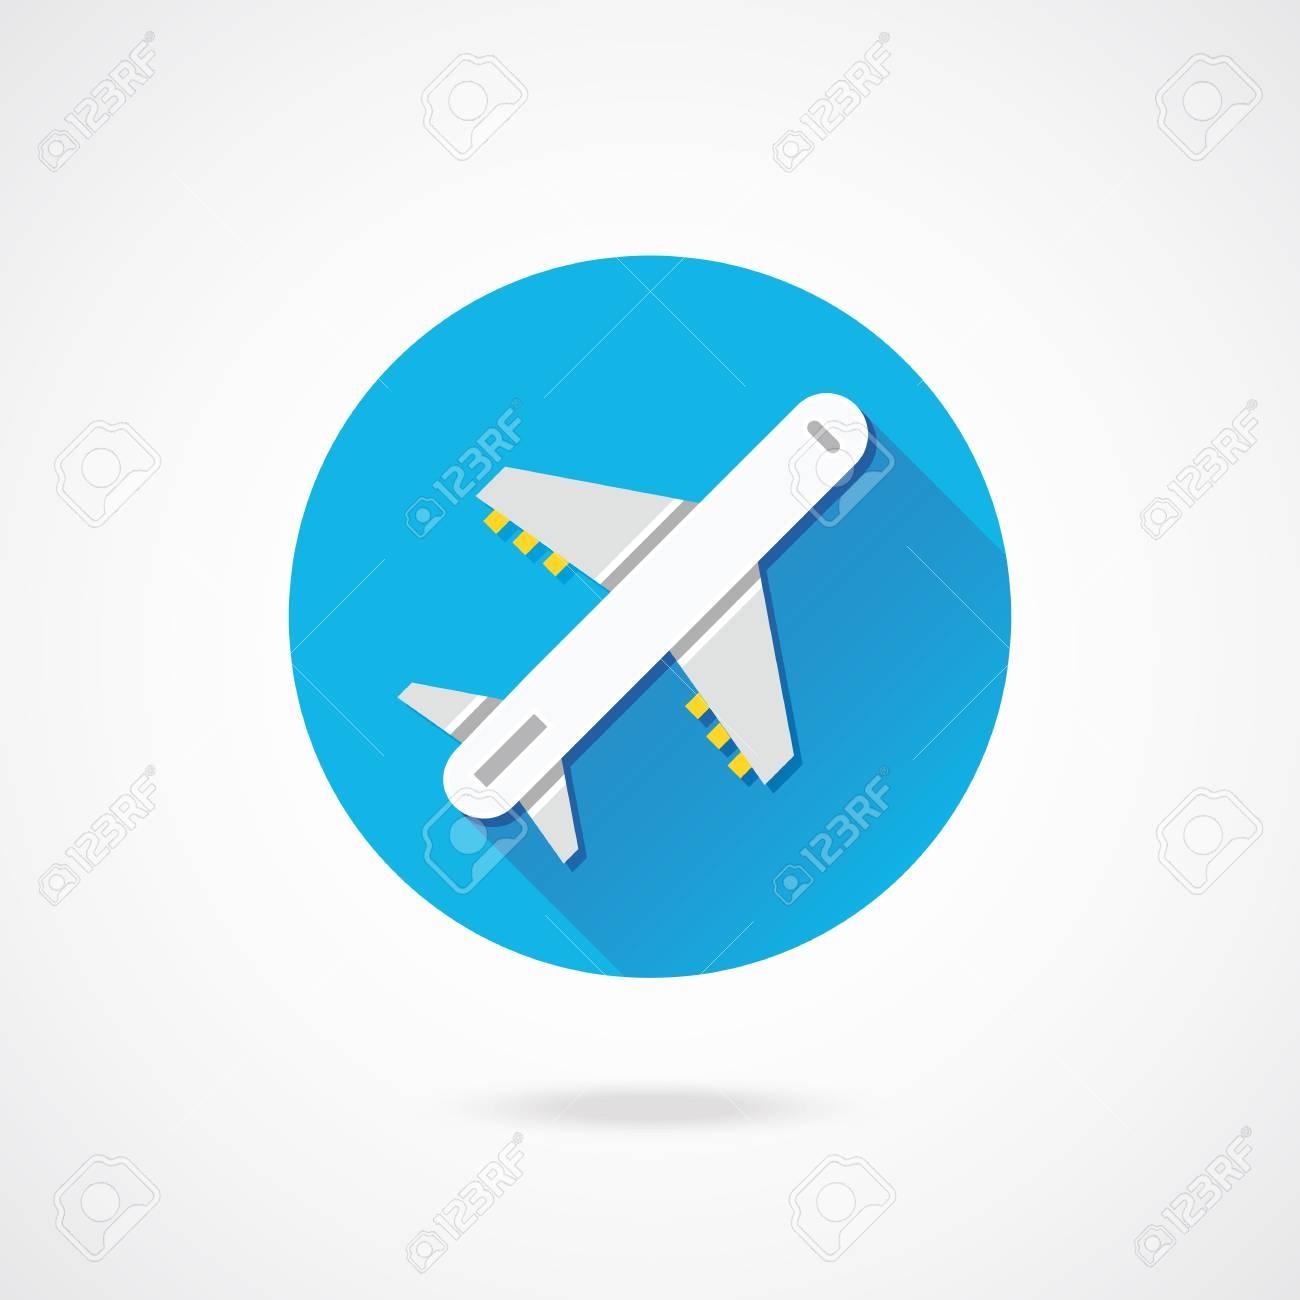 Vector Airplane Icon Stock Vector - 23159740